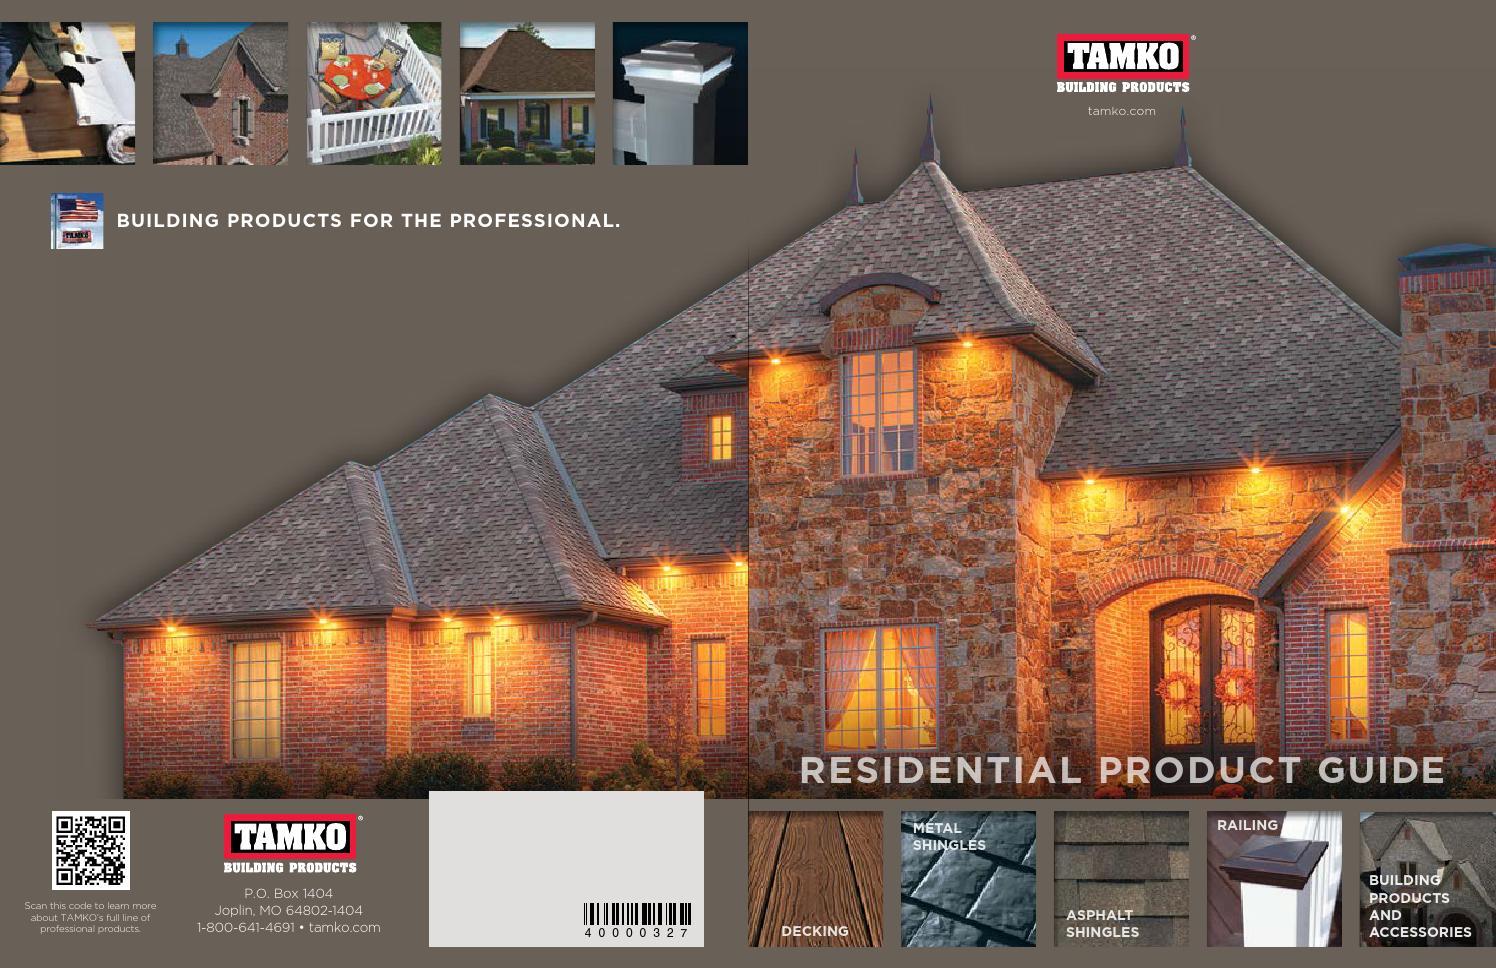 Tamko Full Line Brochure By Meek S Lumber Amp Hardware Issuu